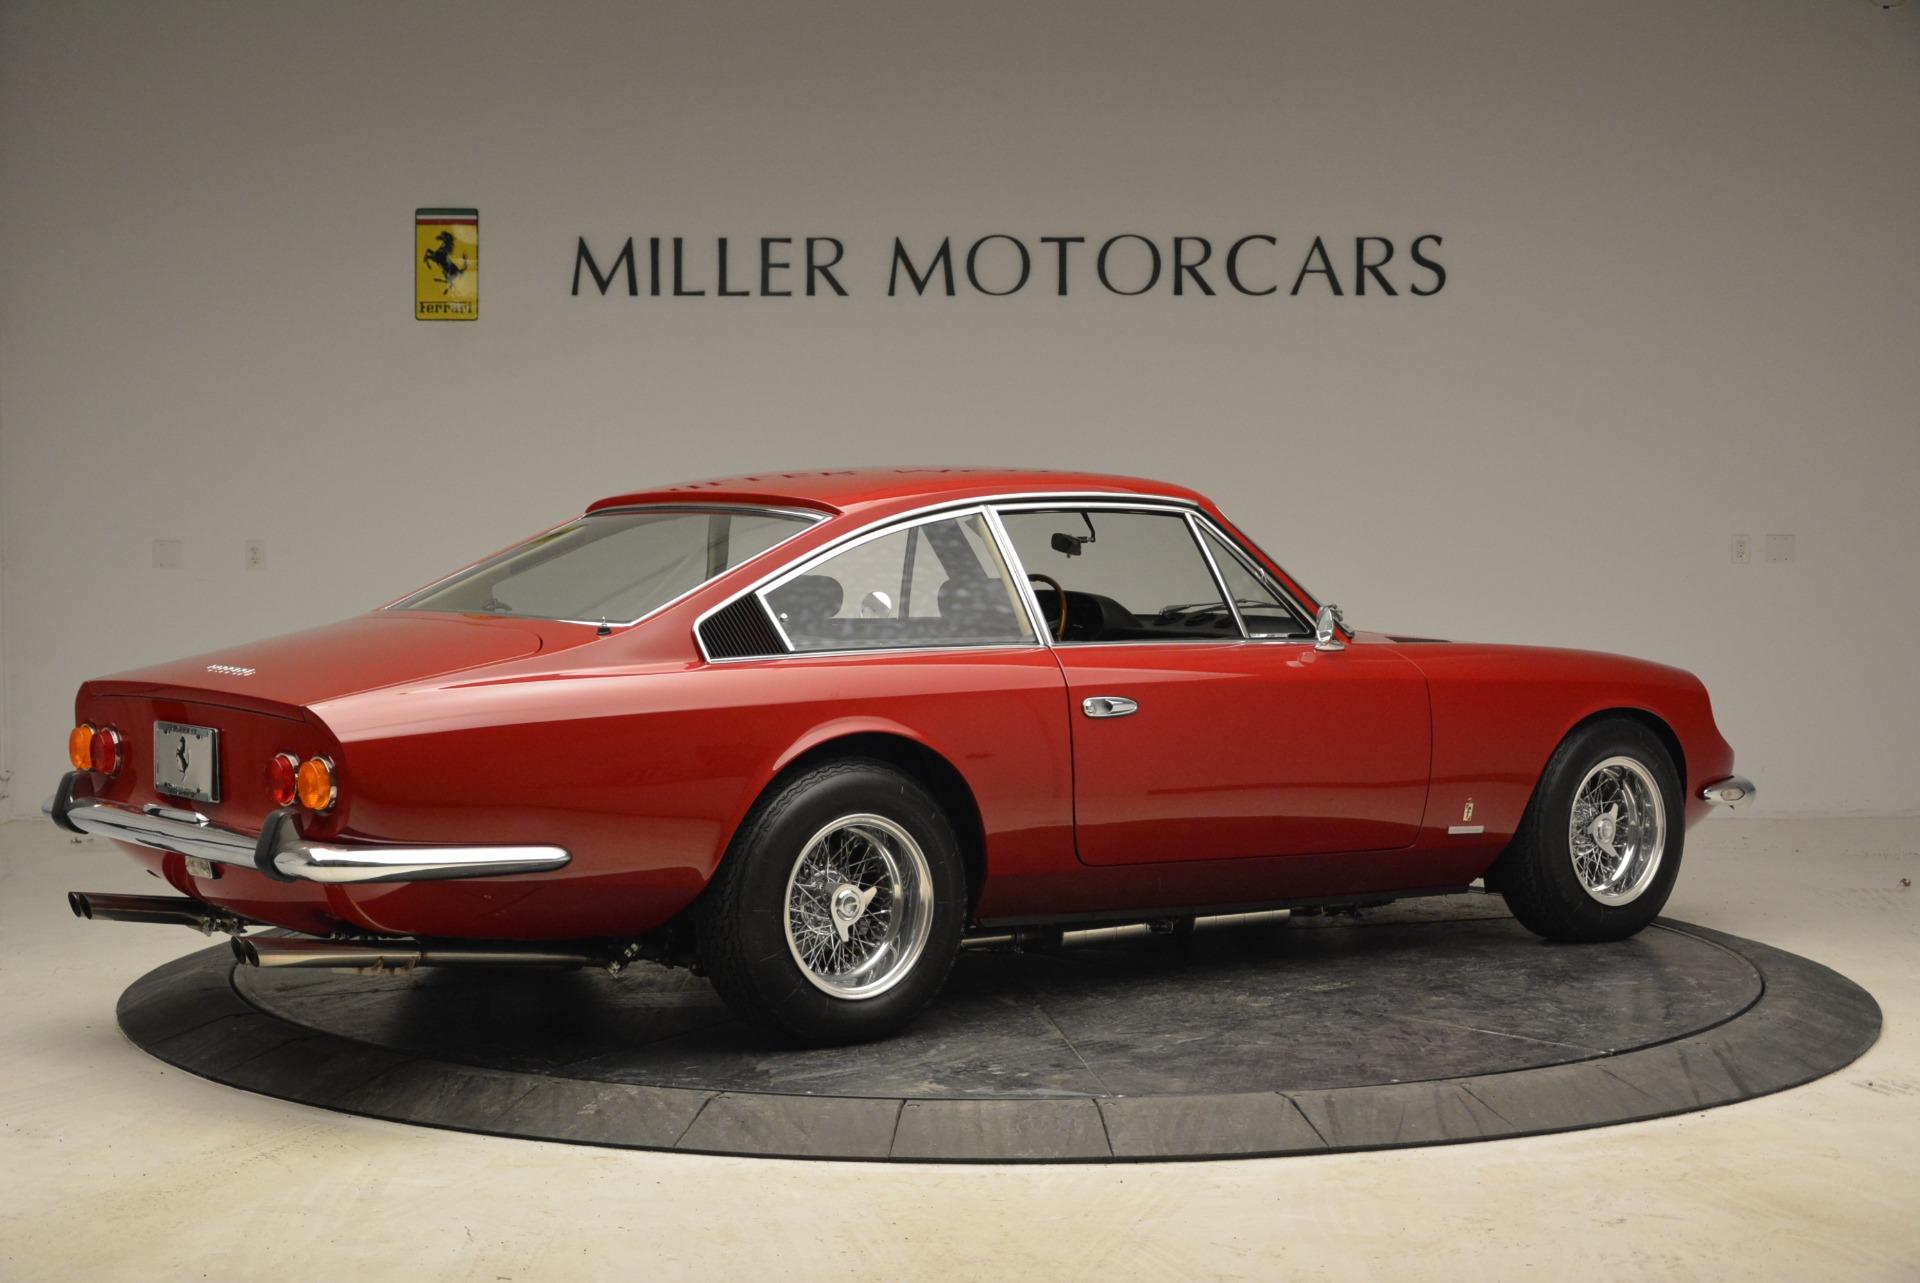 Used 1969 Ferrari 365 GT 2+2  For Sale In Greenwich, CT 1995_p8